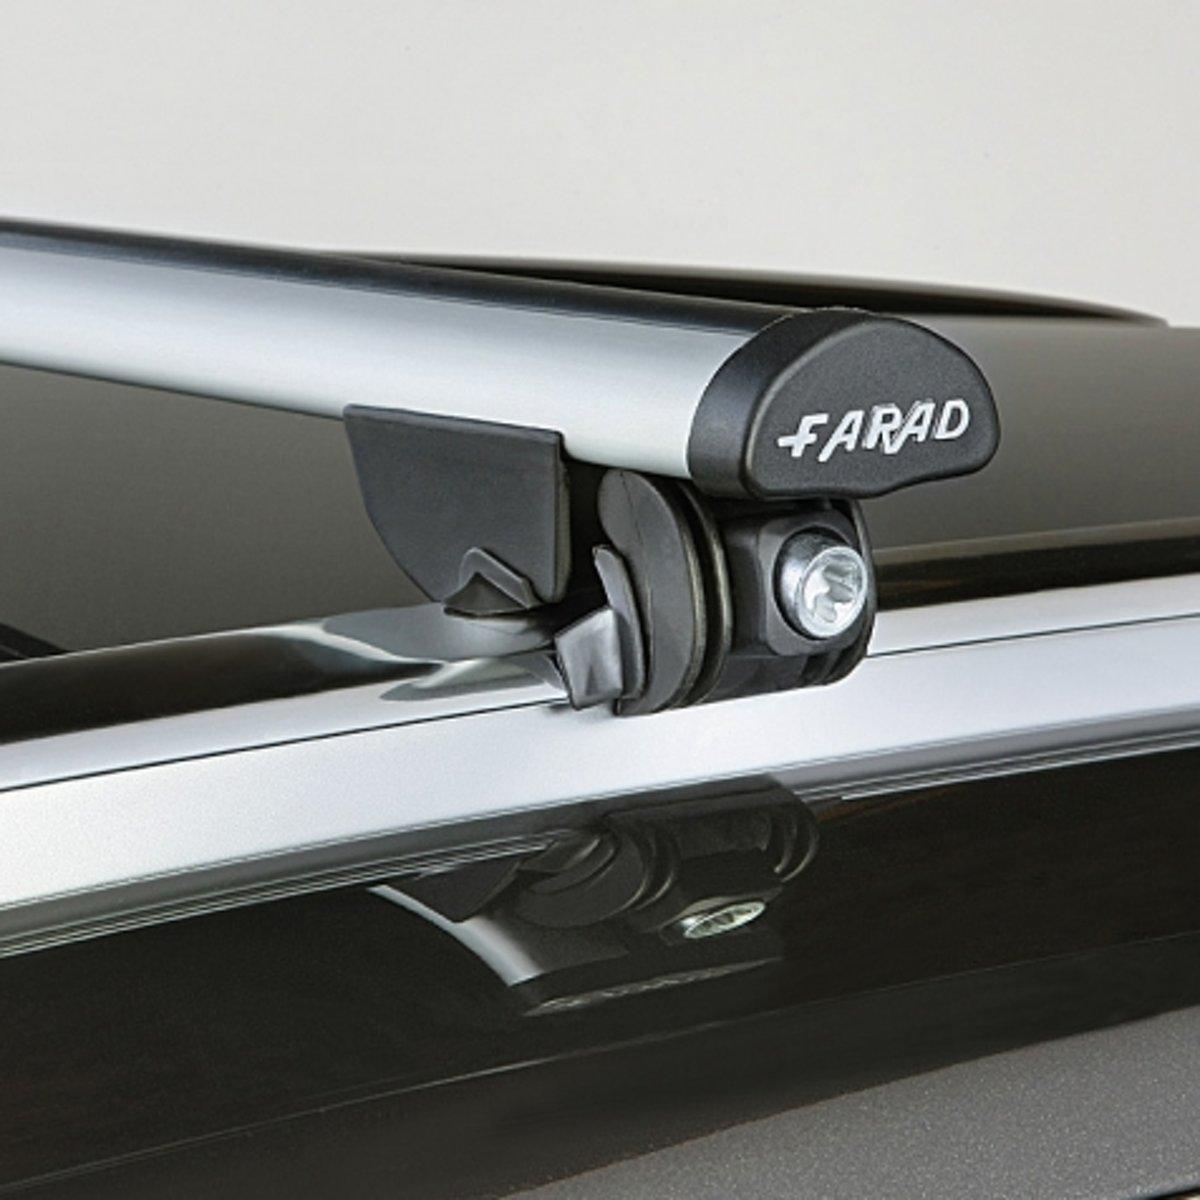 Faradbox dakdragers Mitsubishi Outlander (PHEV) 2013 (ook model na 2015) gesloten dakrail, 100kg laadvermogen kopen